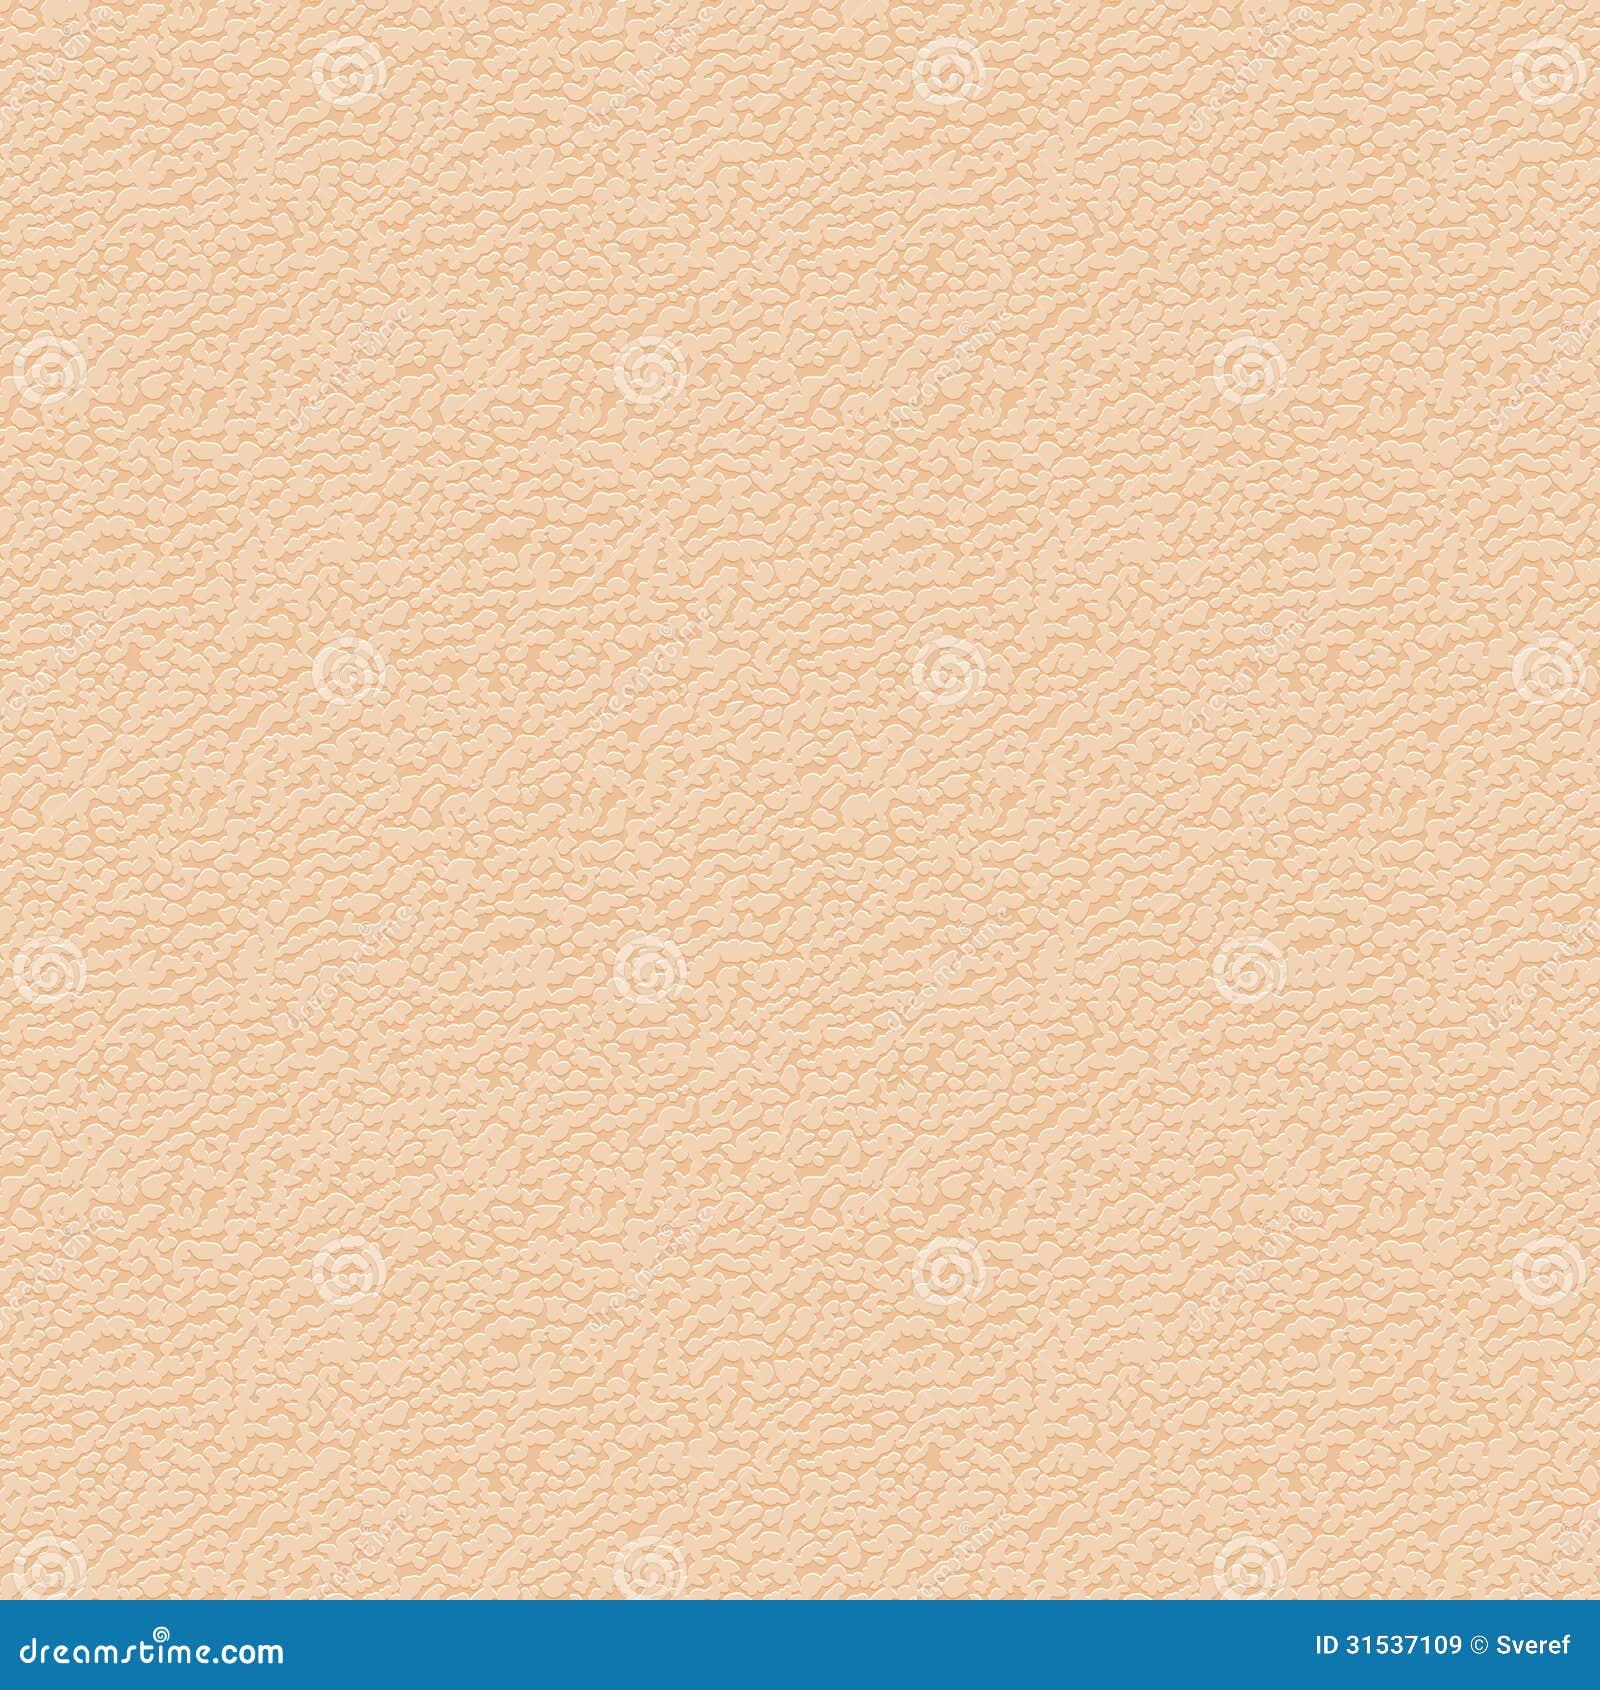 human skin stock image image of pattern texture integument 3359457 human skin royalty free stock images image 31537109